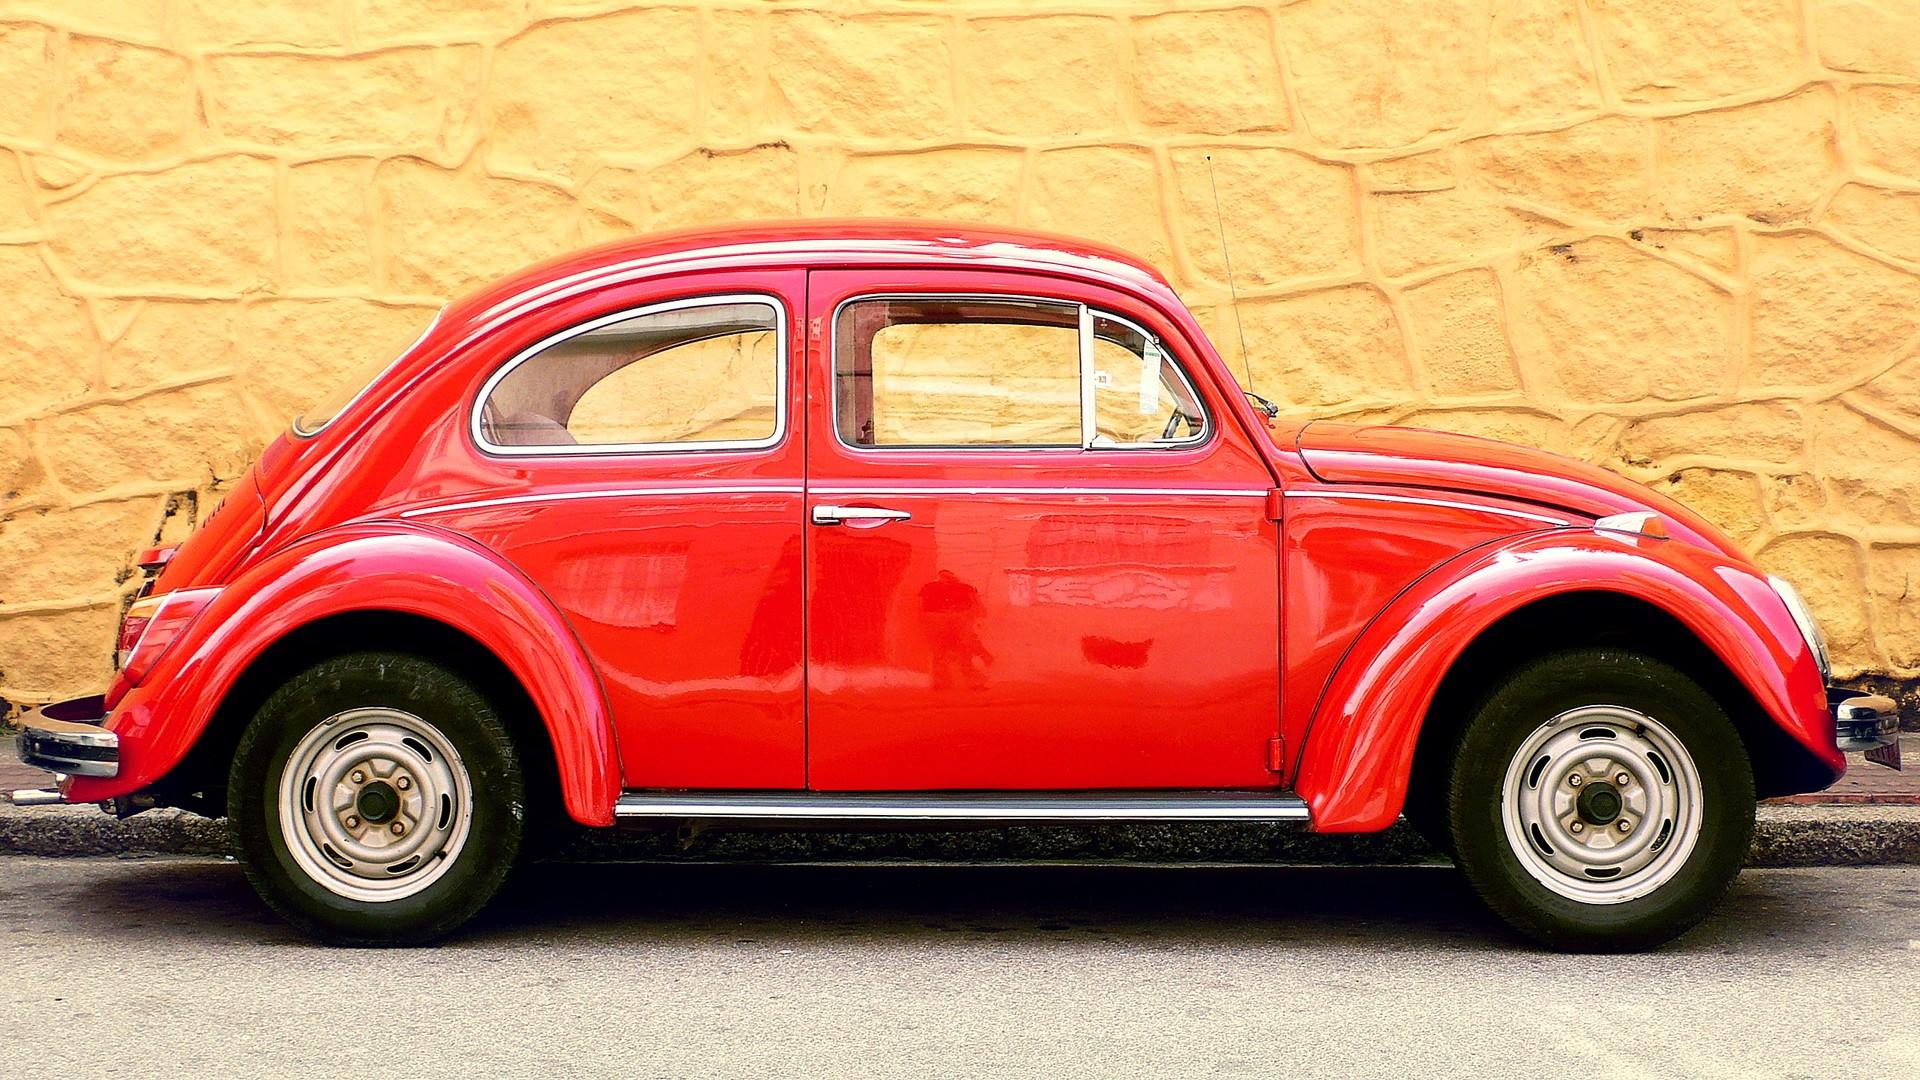 Image Result For Volkswagen Wallpaper Background Images For Wallpaper Volkswagen Hd Wallpapers Backgrounds Wallpaper Abyss